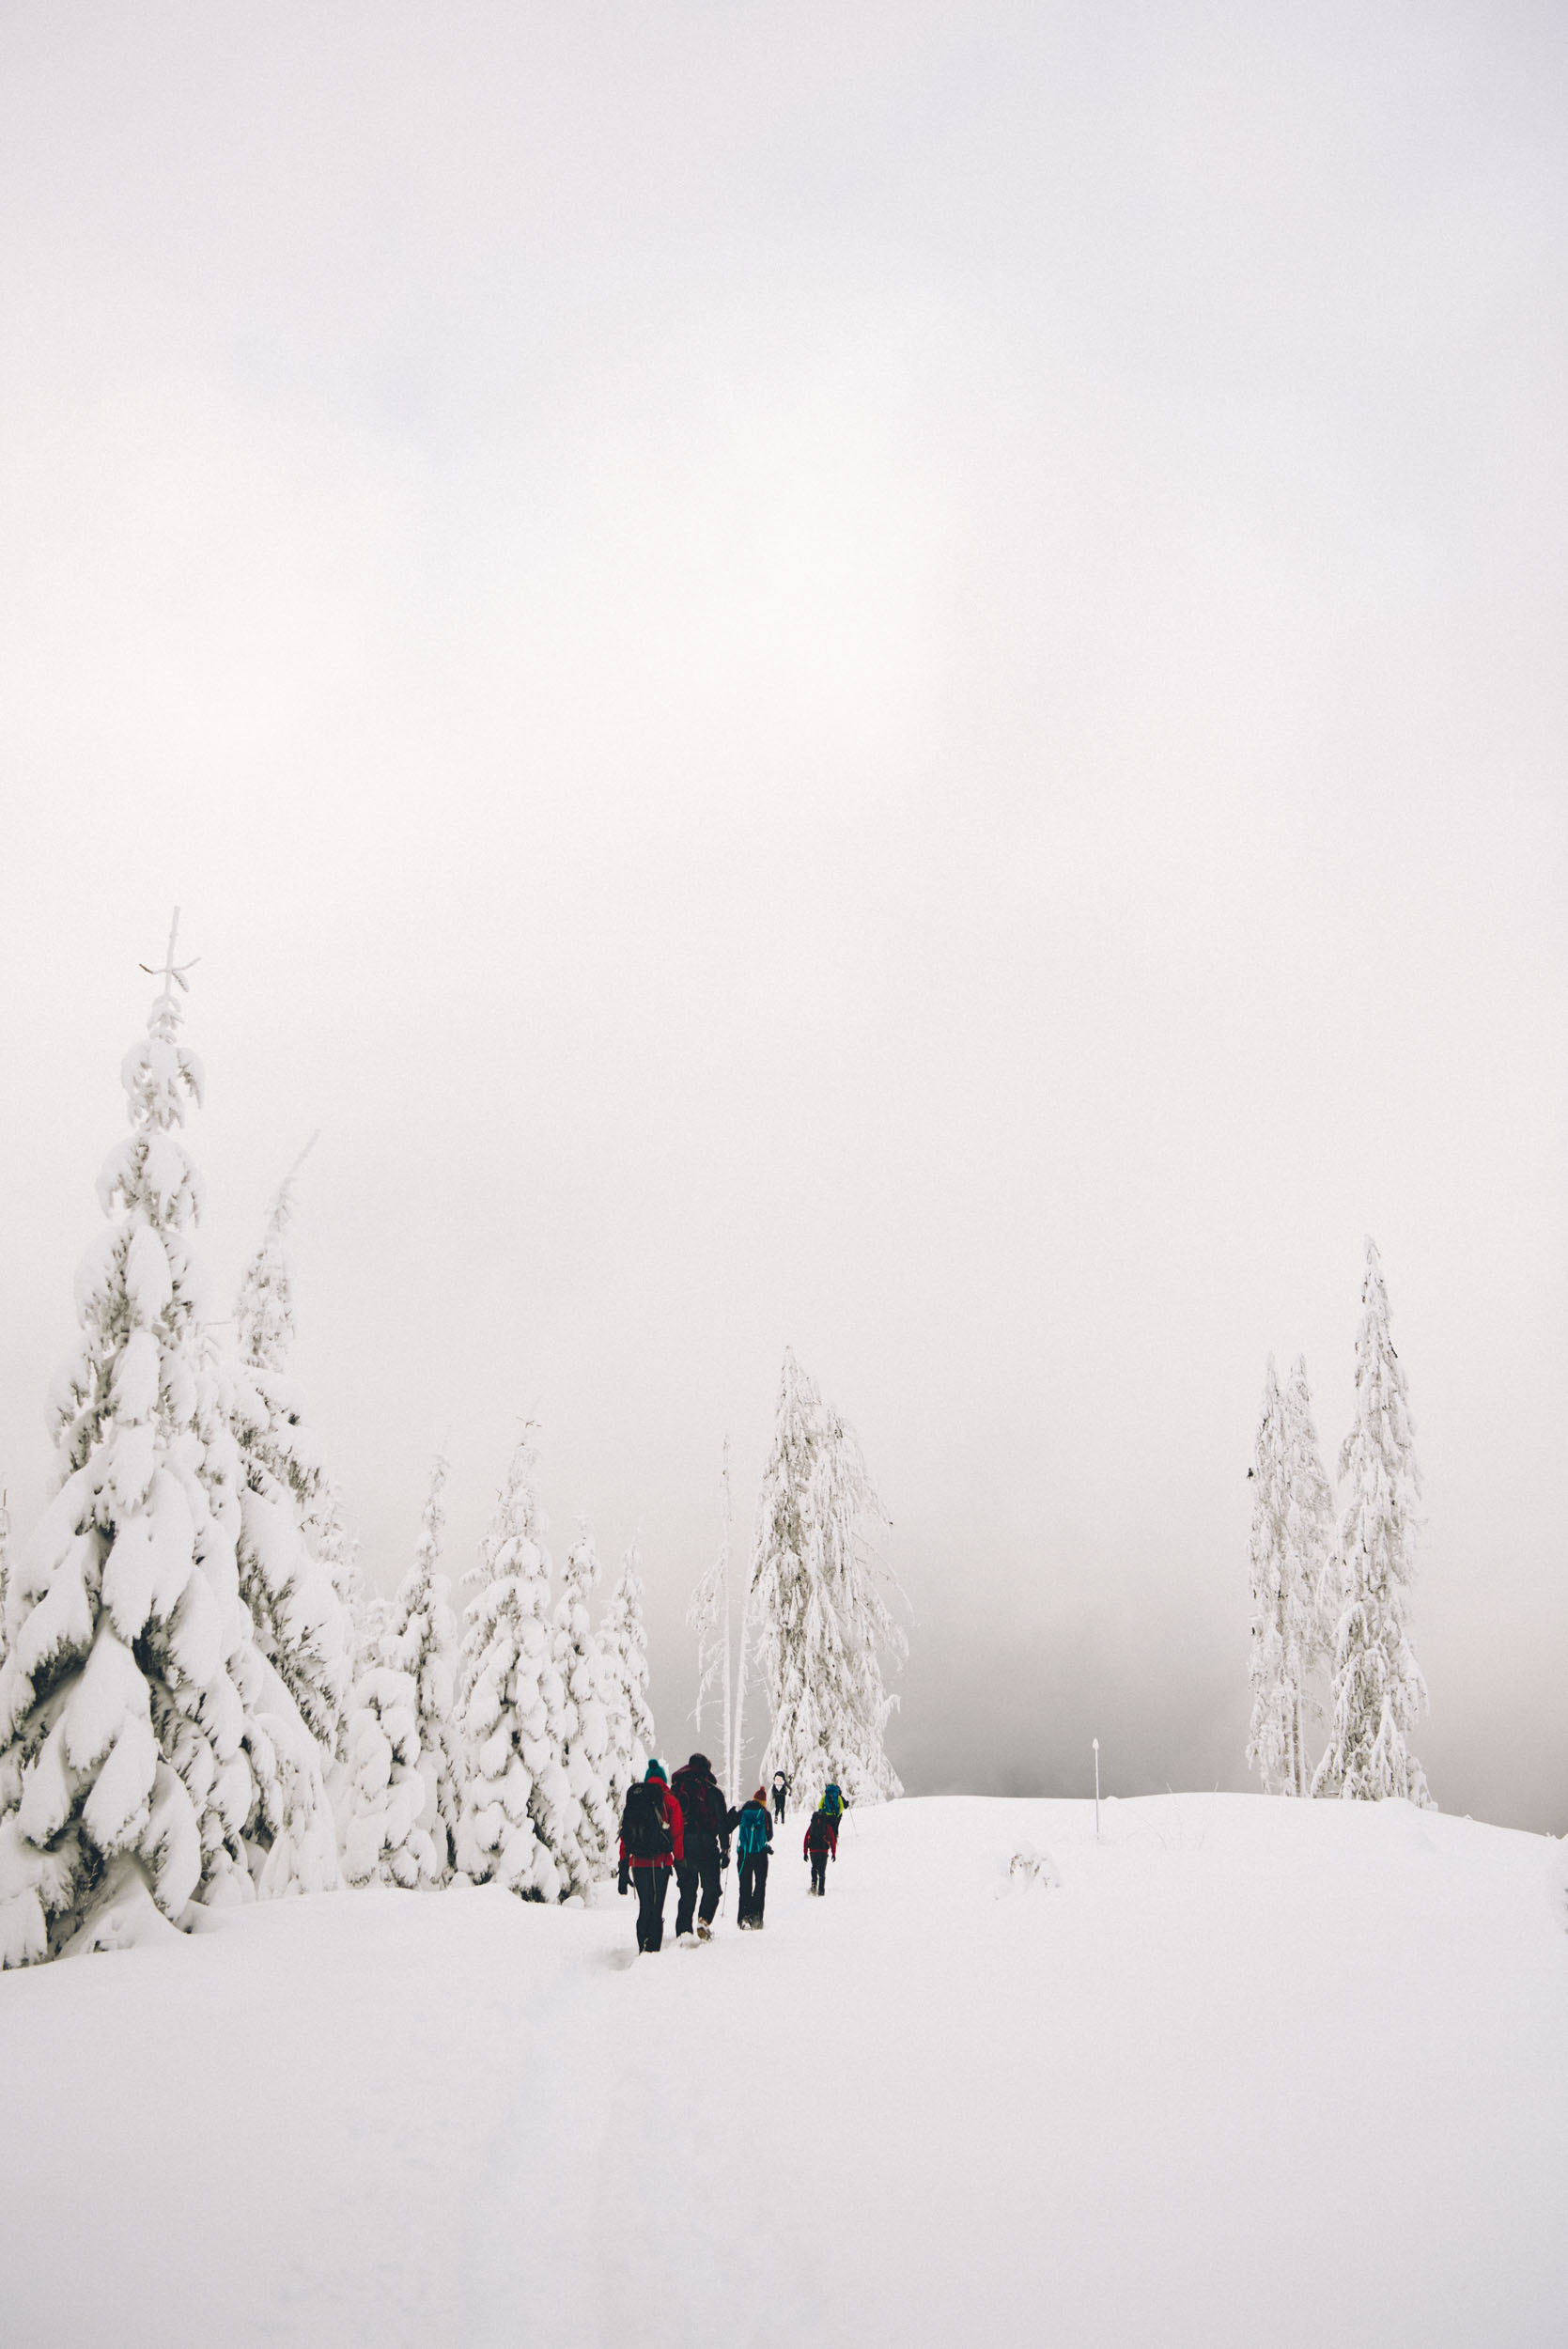 Miriam-Subbiah-Snow-Bowl-Hut-27.jpg